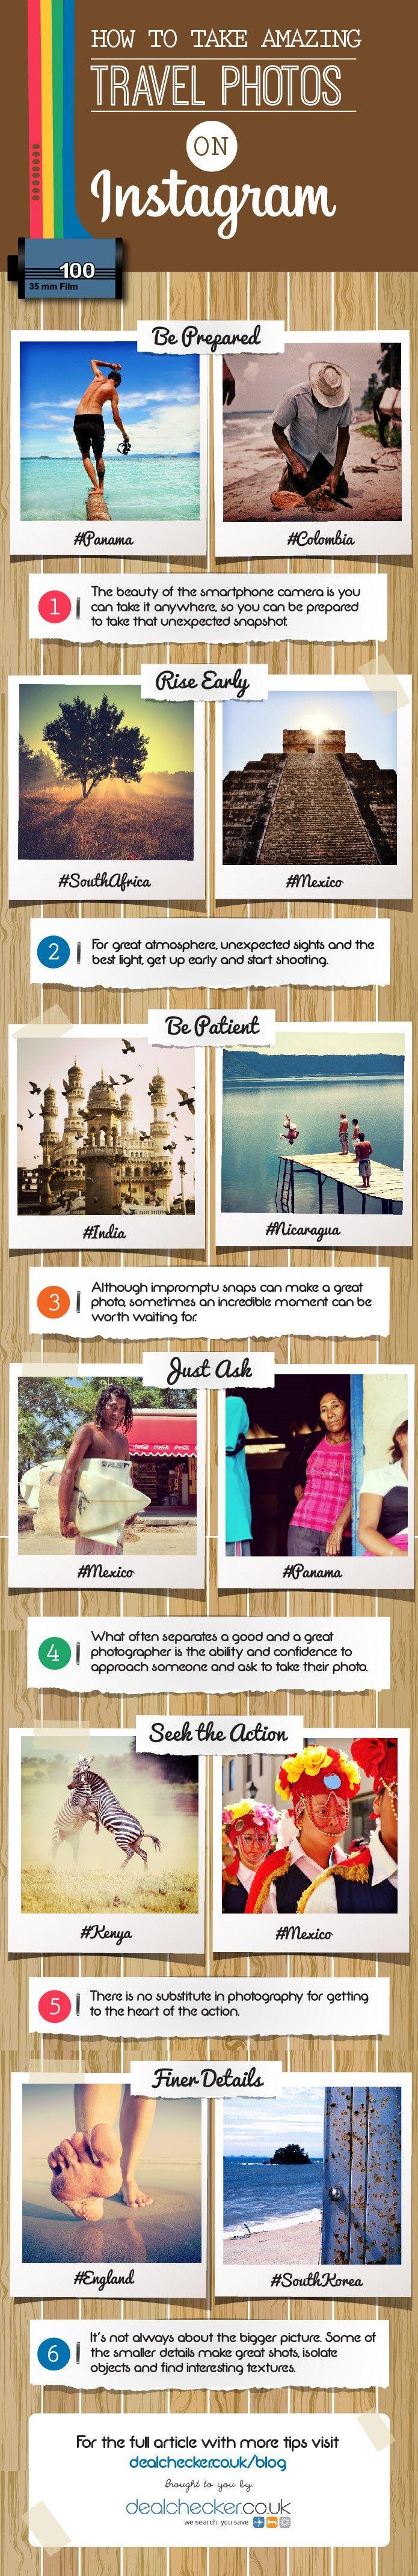 How to Take Amazing Travel Photos on #Instagram